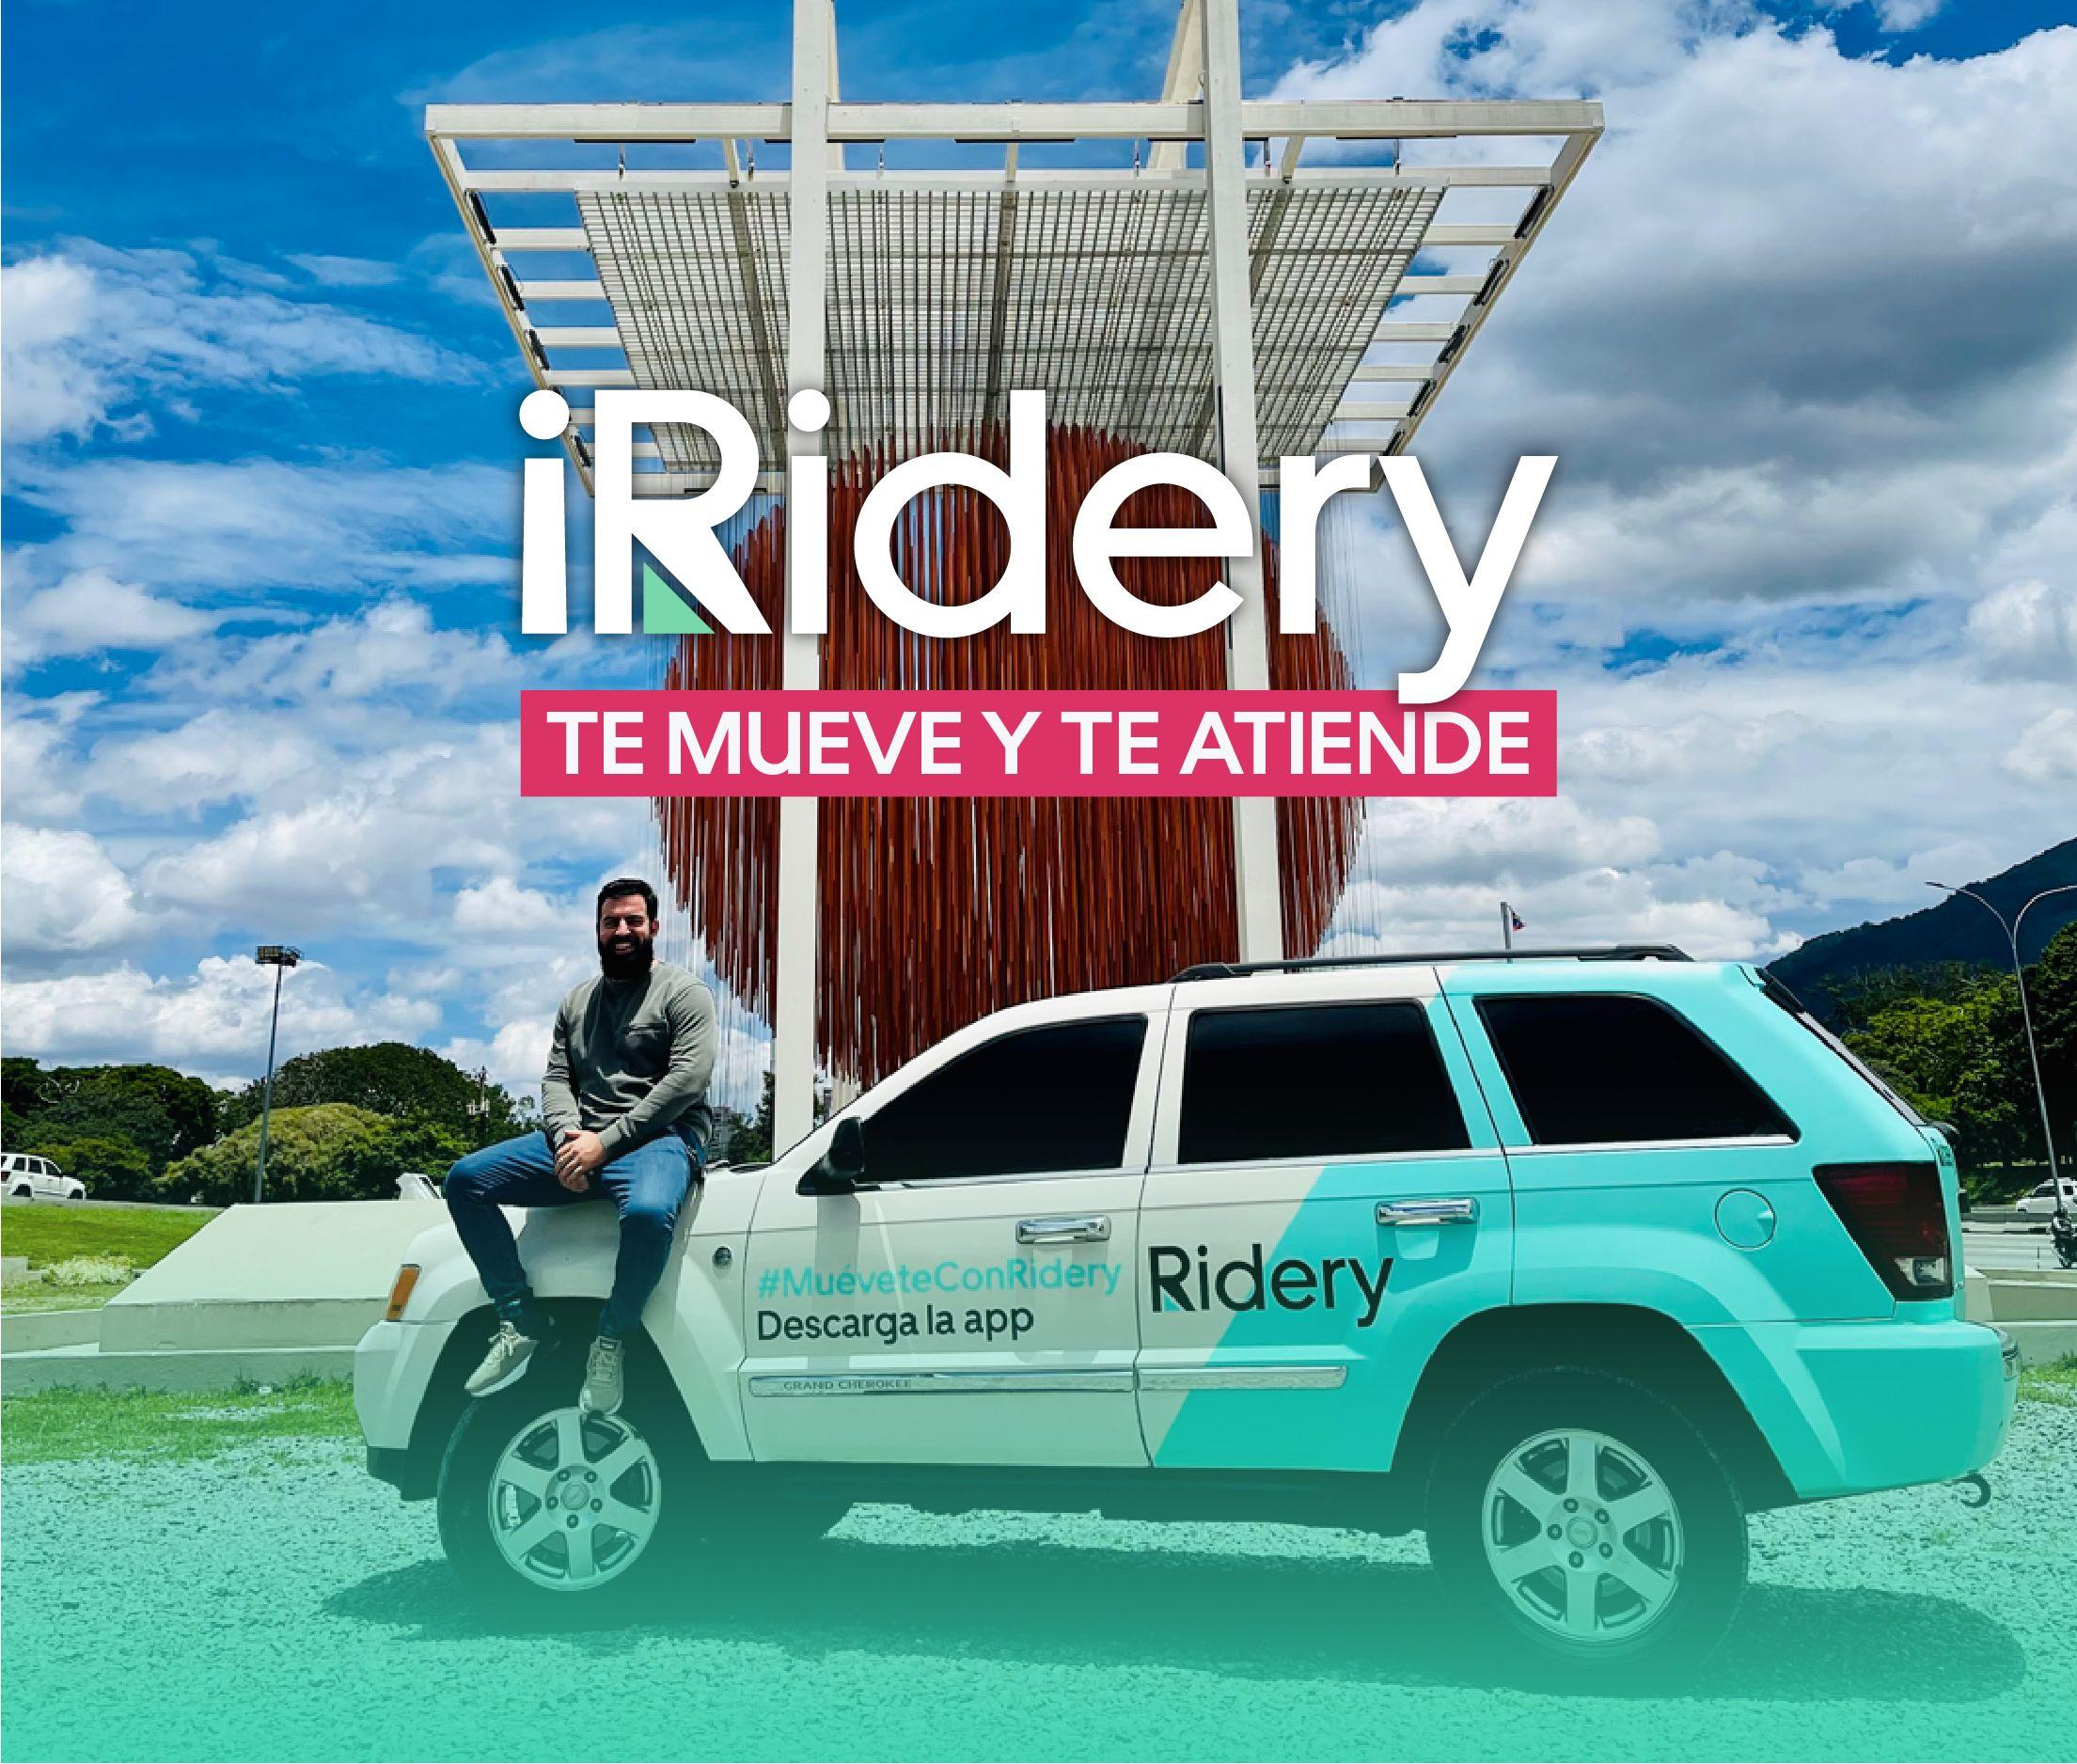 Ridery - Gerson Gómez